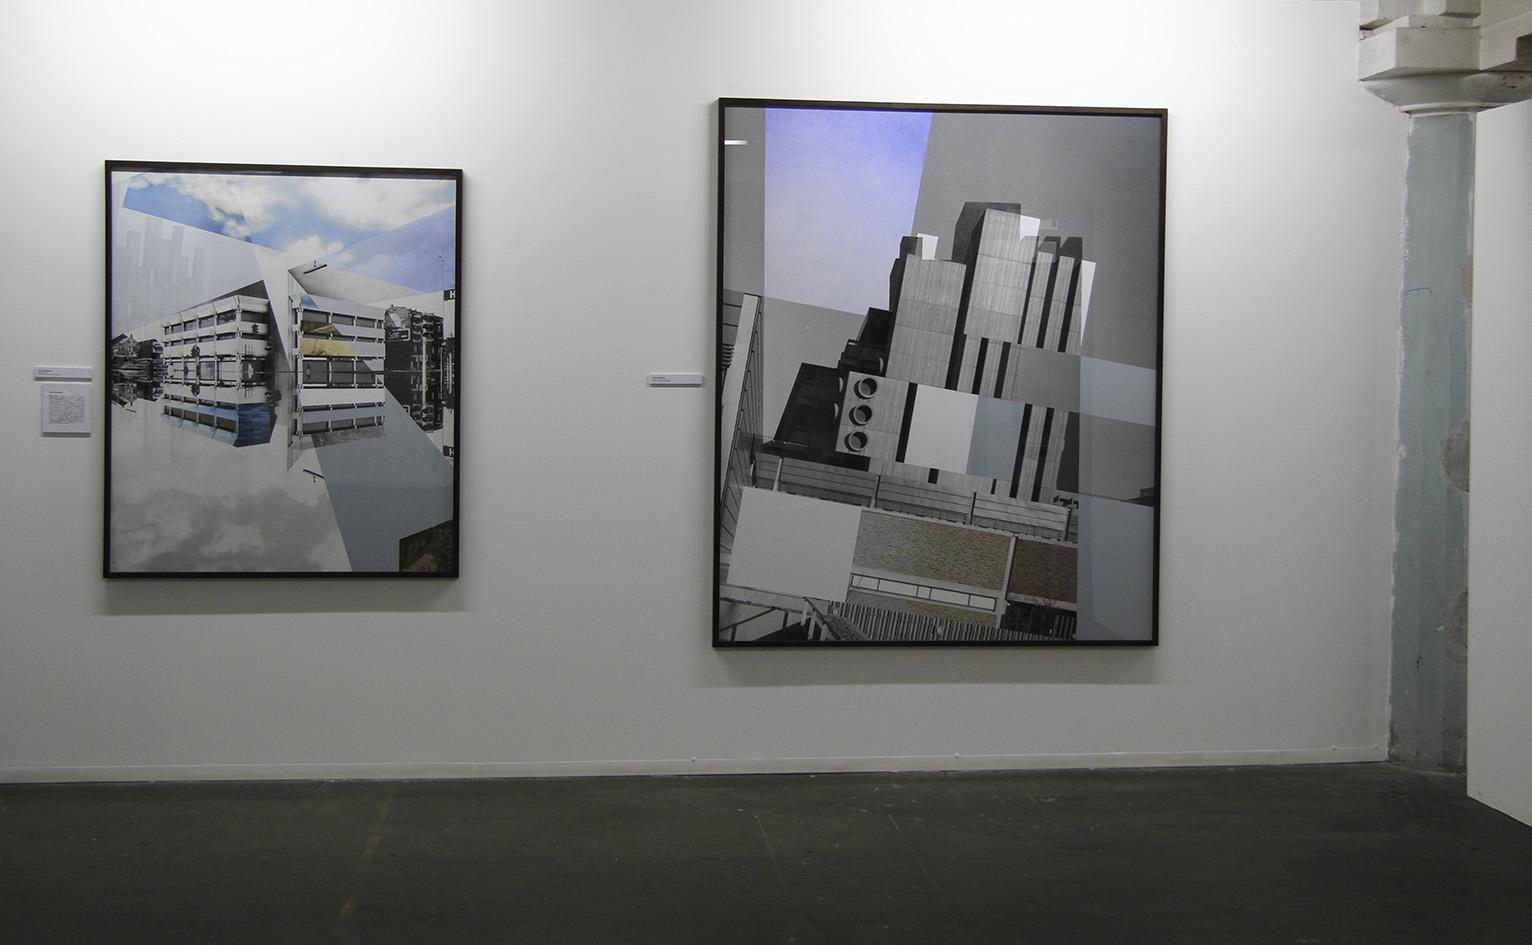 Julie Boserup Installation view fotografisk center